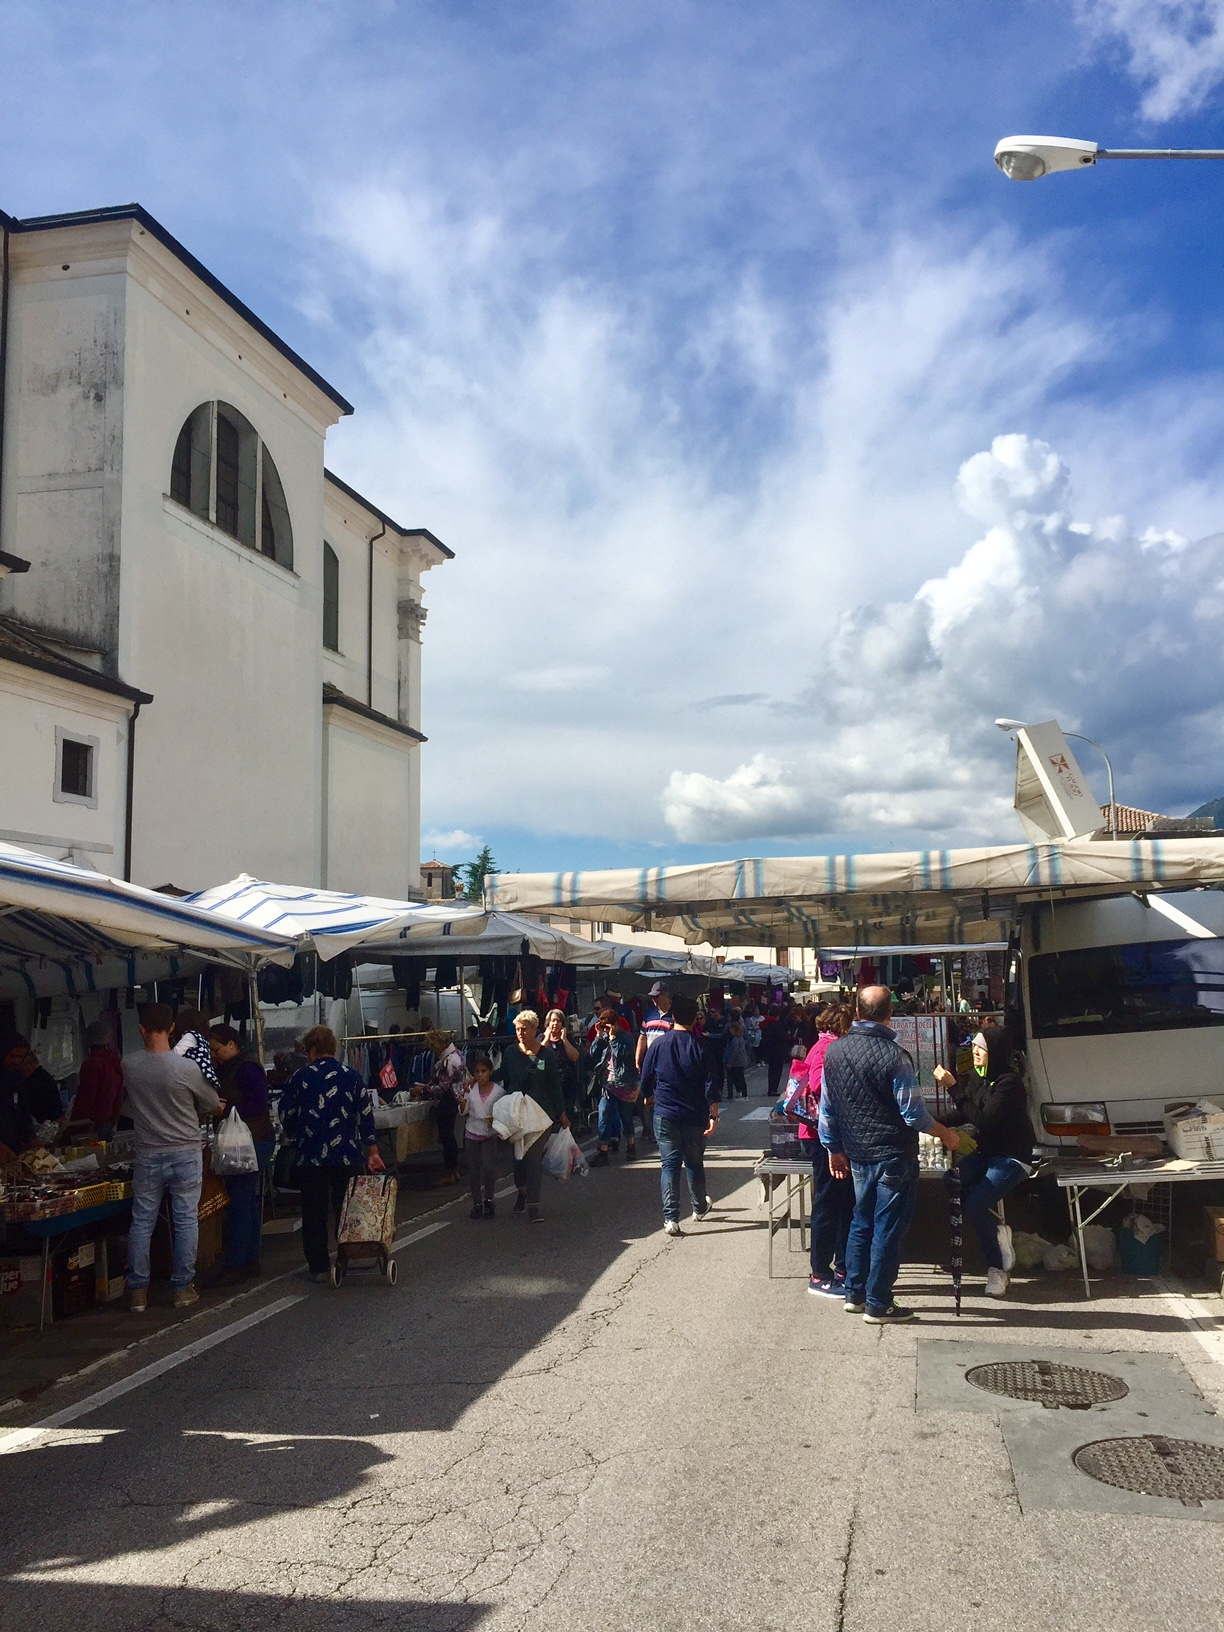 The Crespano del Grappa market on Sunday morning